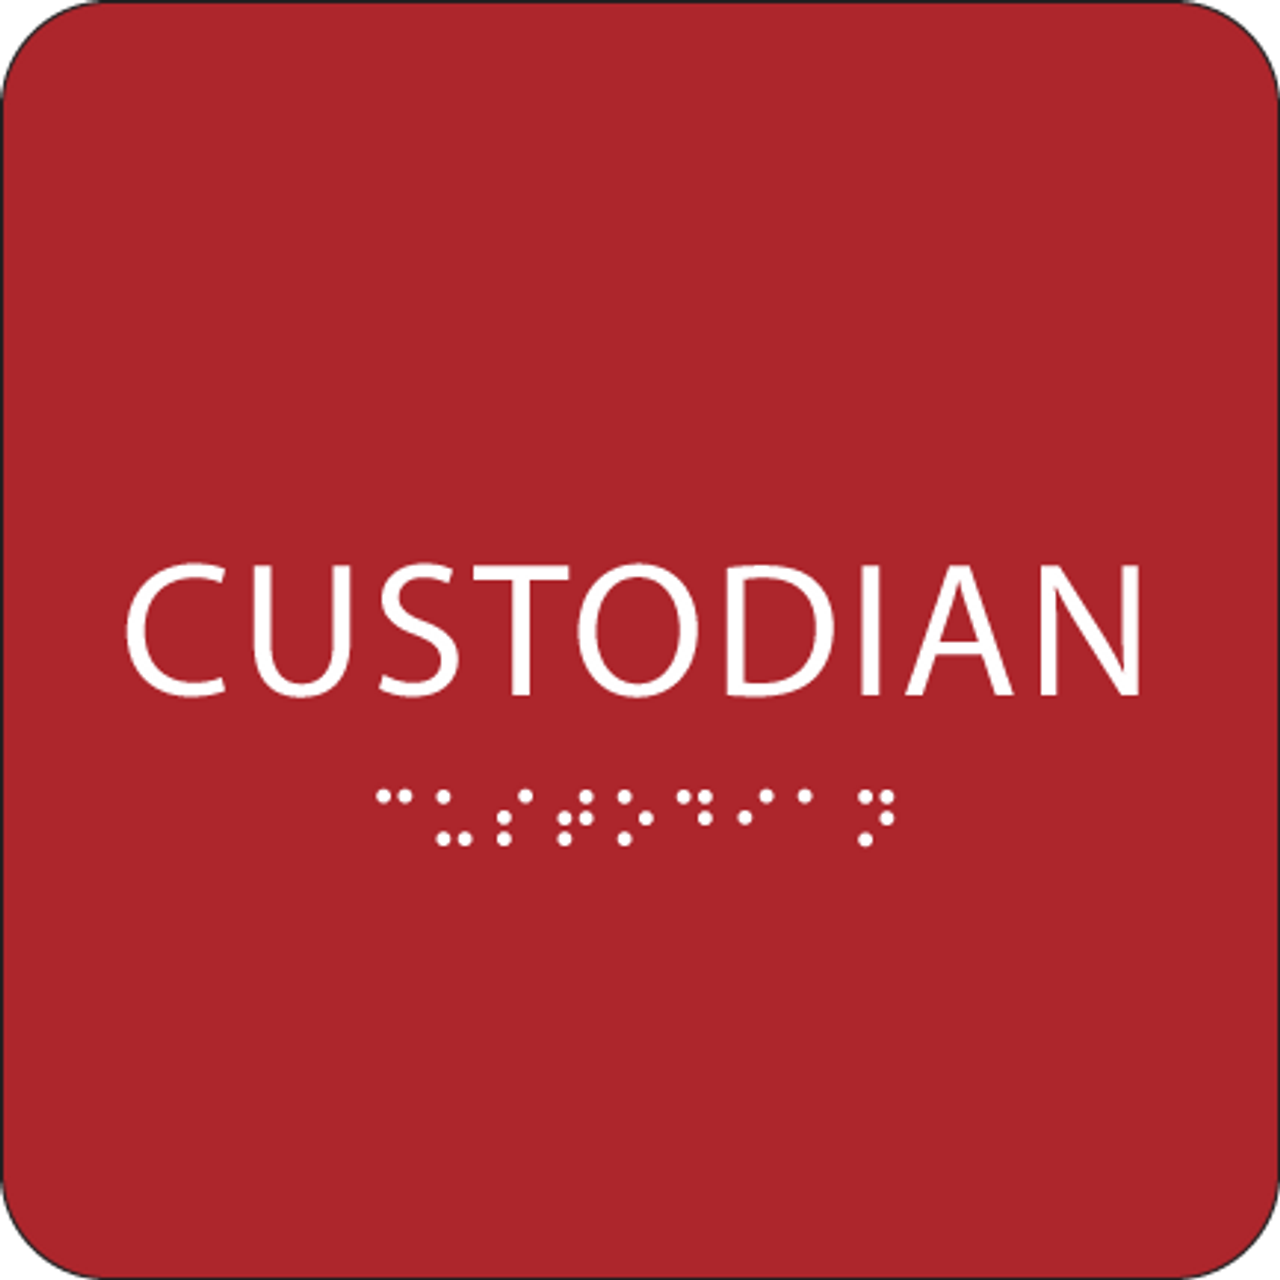 Red Custodian ADA Sign